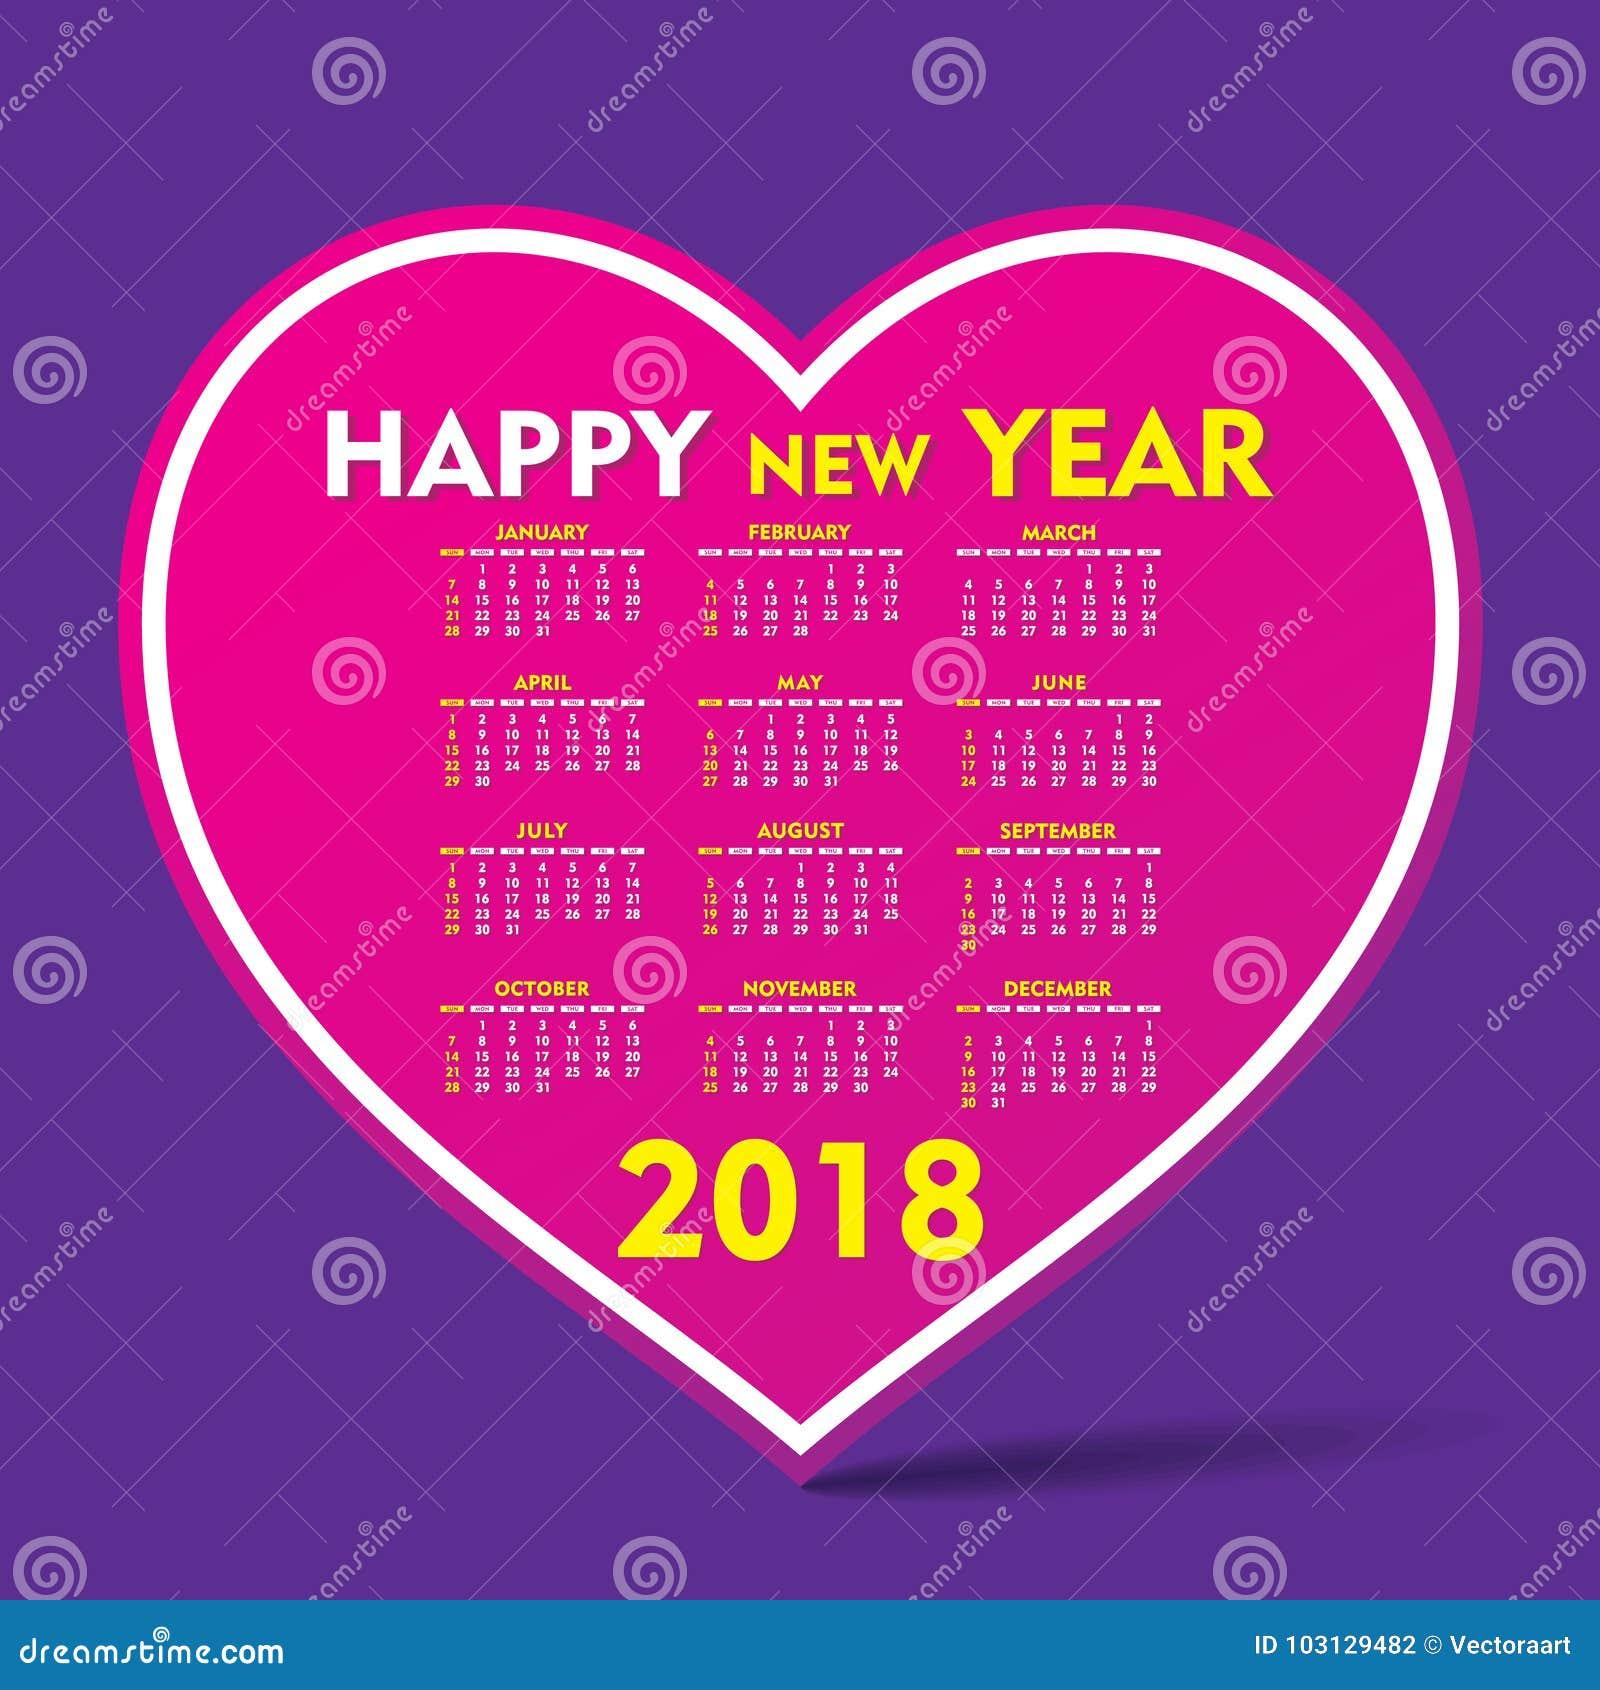 New Year Calendar Design : New year calendar design stock vector image